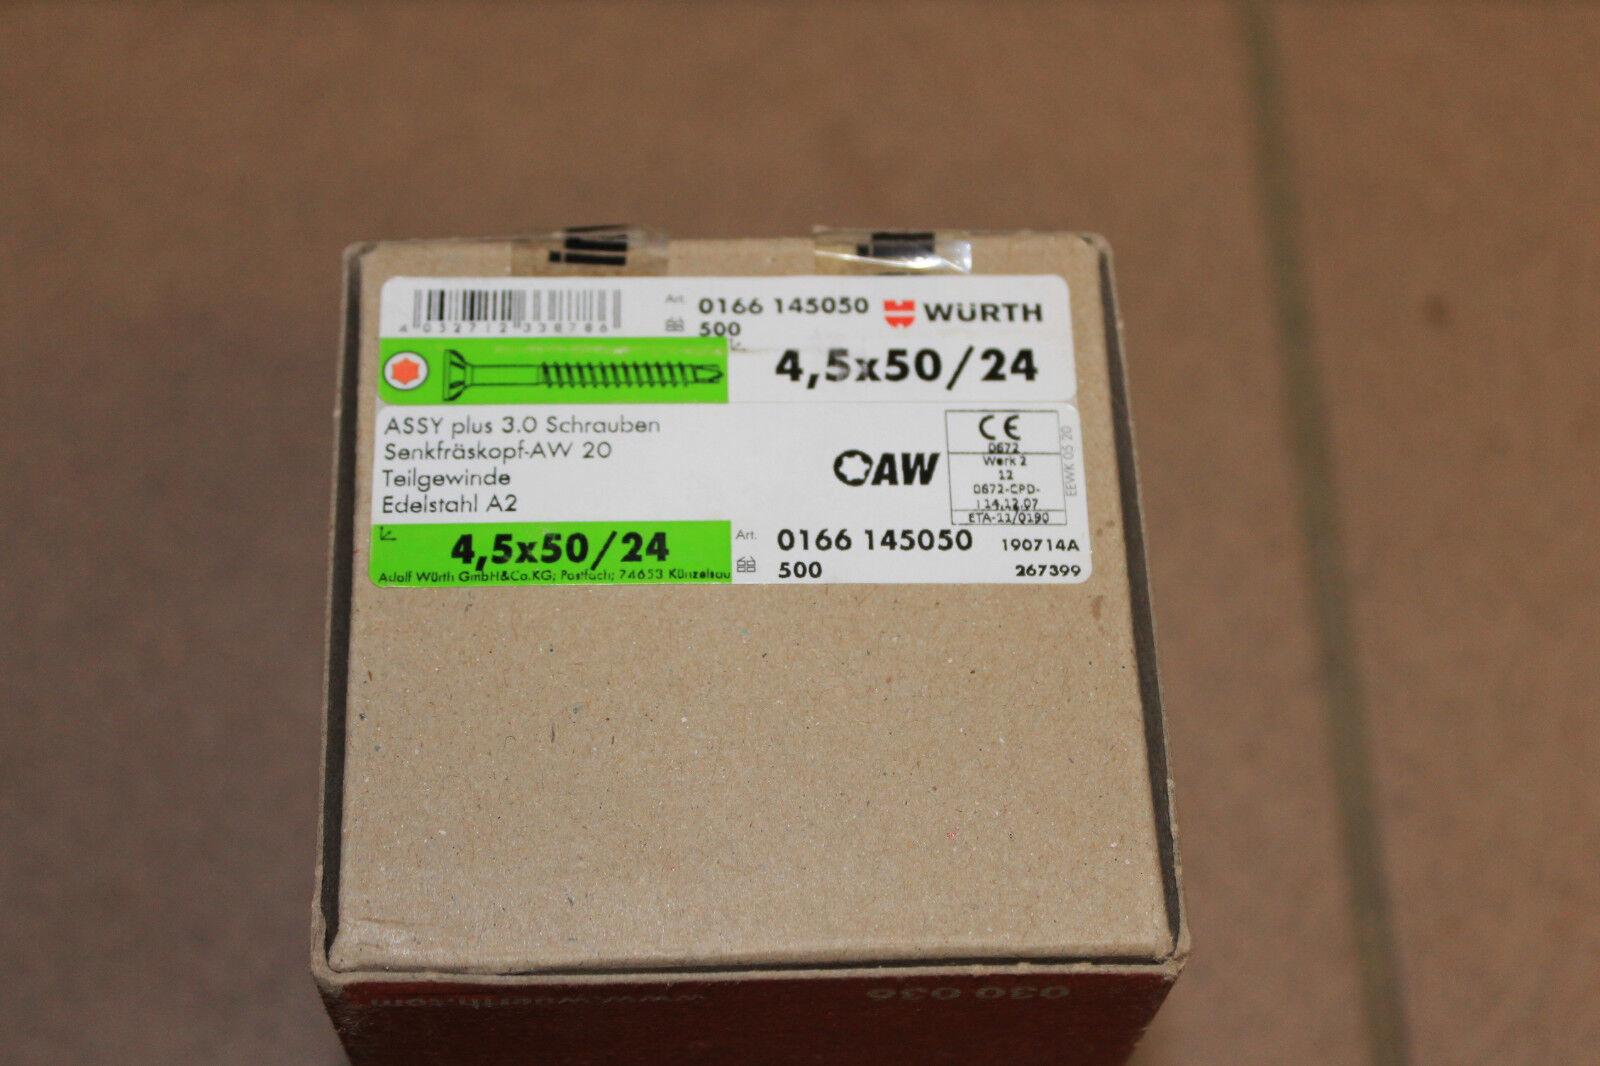 Würth ASSY PLUS 3.0 A2 500 Edelstahlschrauben mit Bohrspitze 4,5x50/24